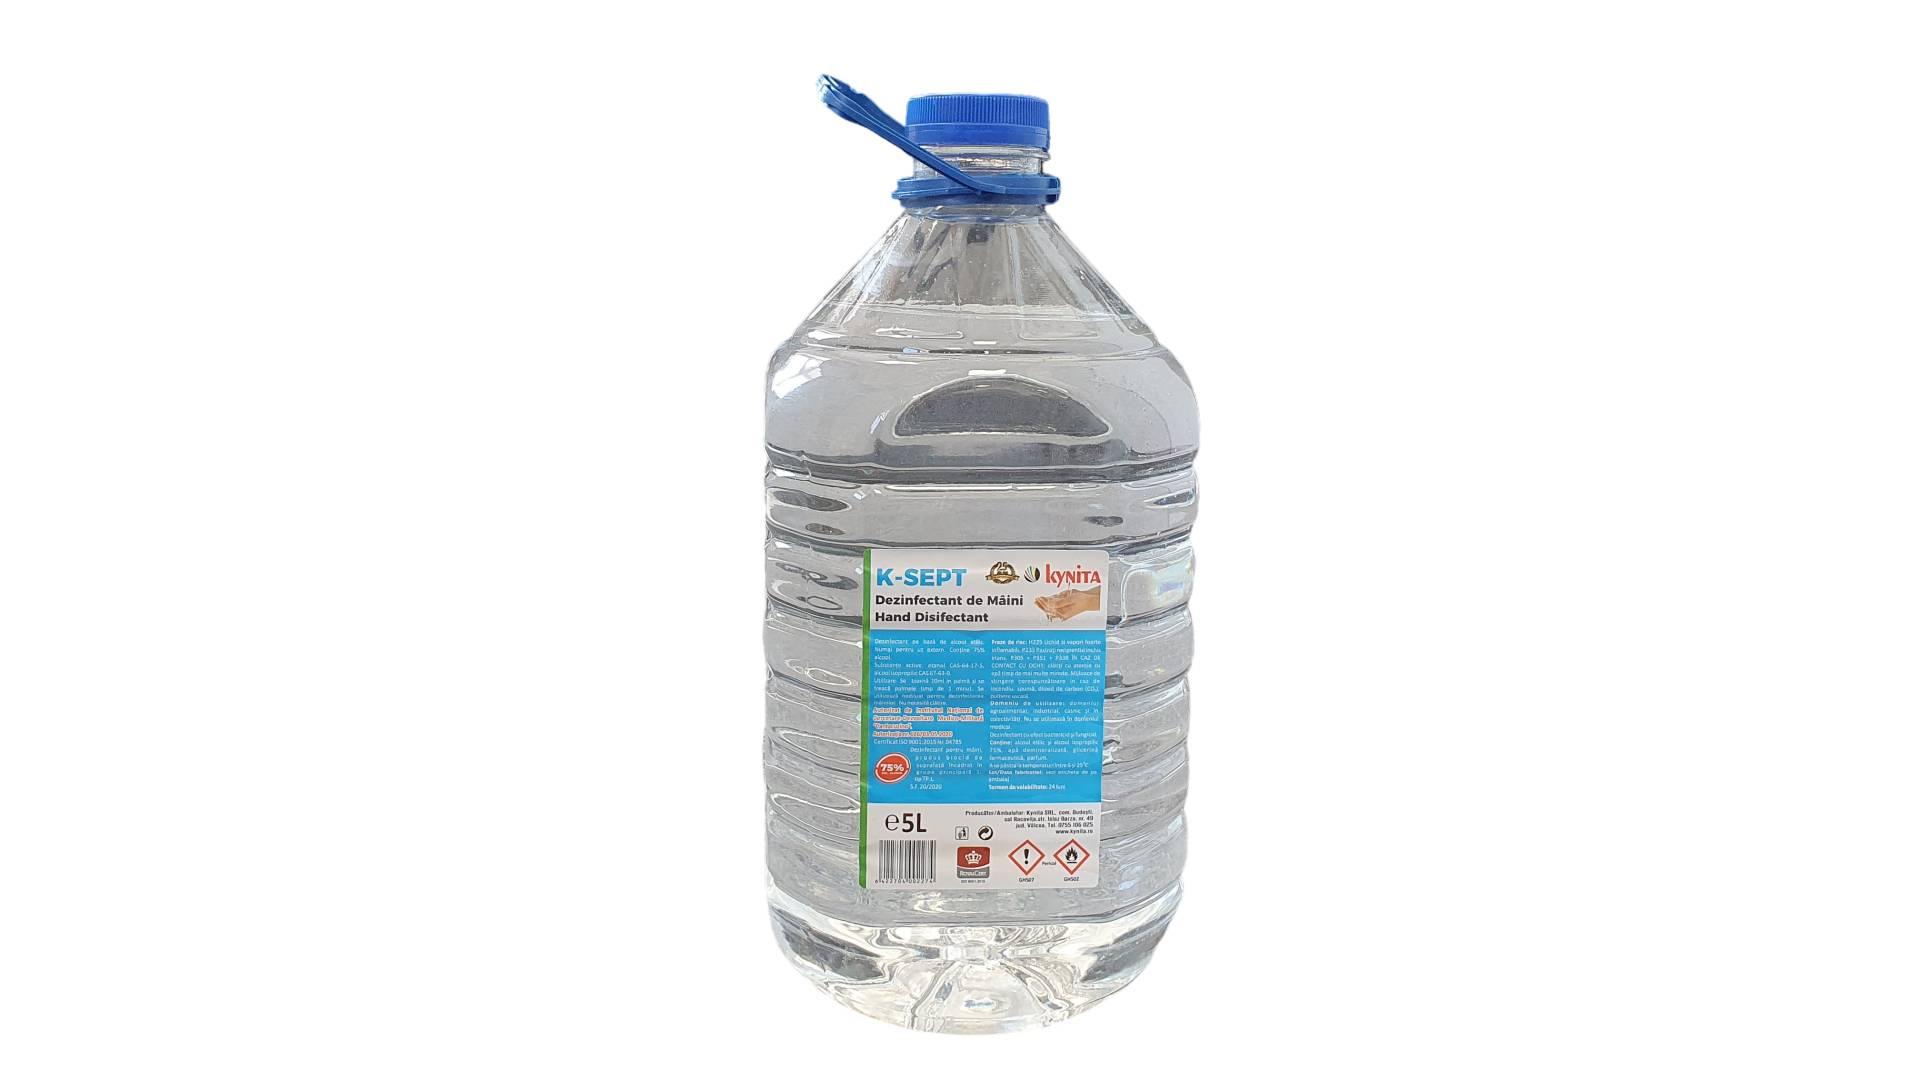 Dezinfectant virucid de maini bidon PET 5 litri, 75% alcool, avizat virucid, bactericid si fungicid imagine 2021 somnart.ro